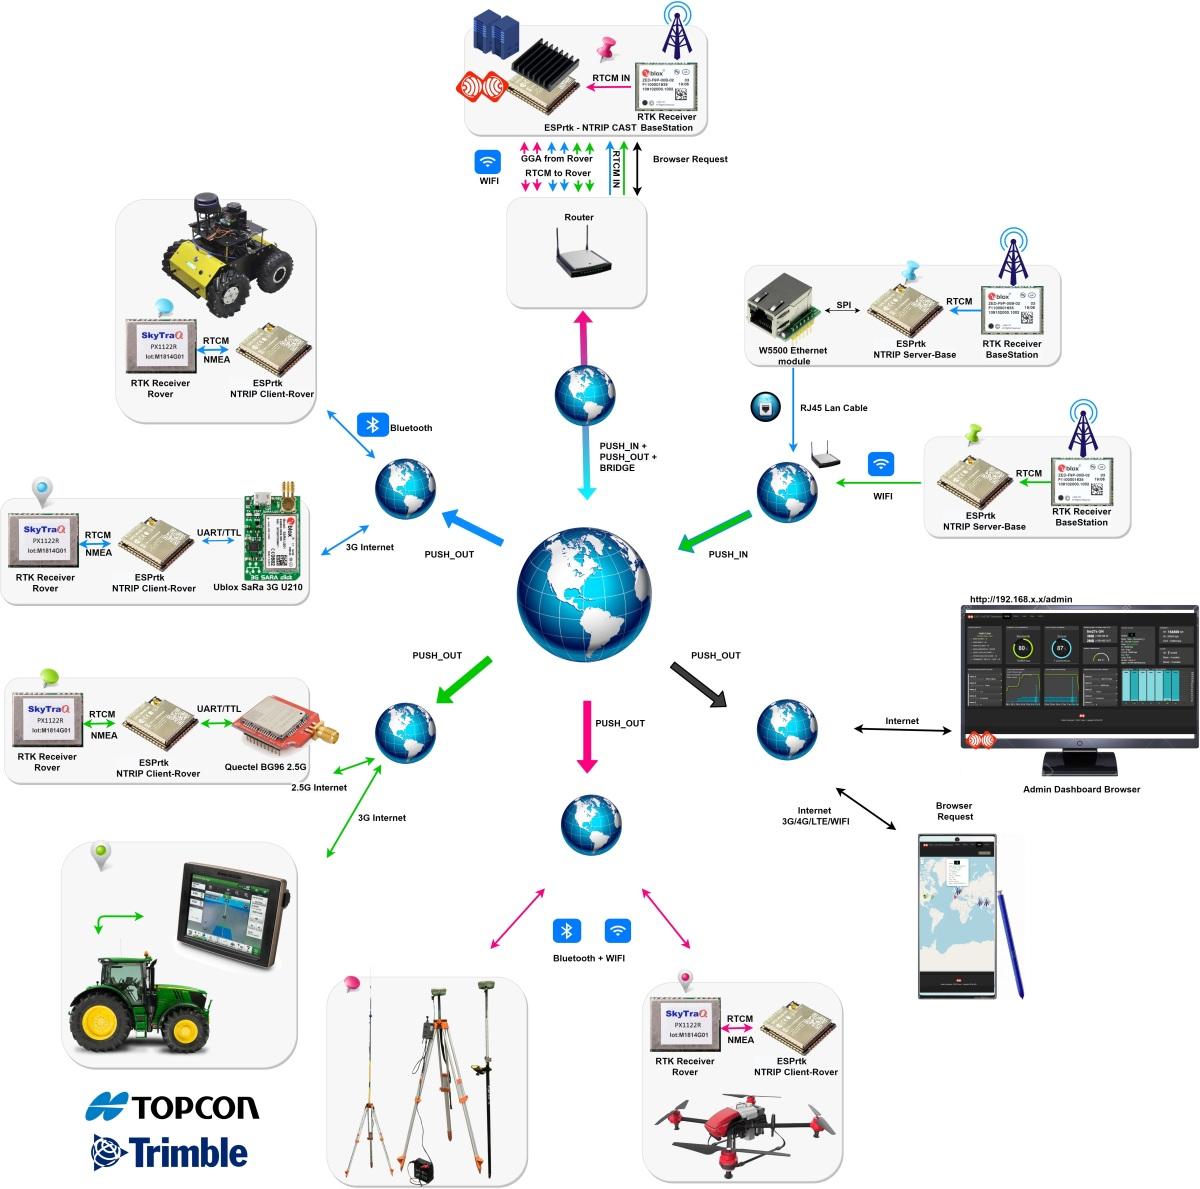 Image (), Link : https://esprtk.files.wordpress.com/2021/04/esprtk-ntrip-caster-esp32-ntrip-server-rtk-px1122r-ns-hp-f9p-static-ip-globle-network.jpg - Copy right ESPrtk